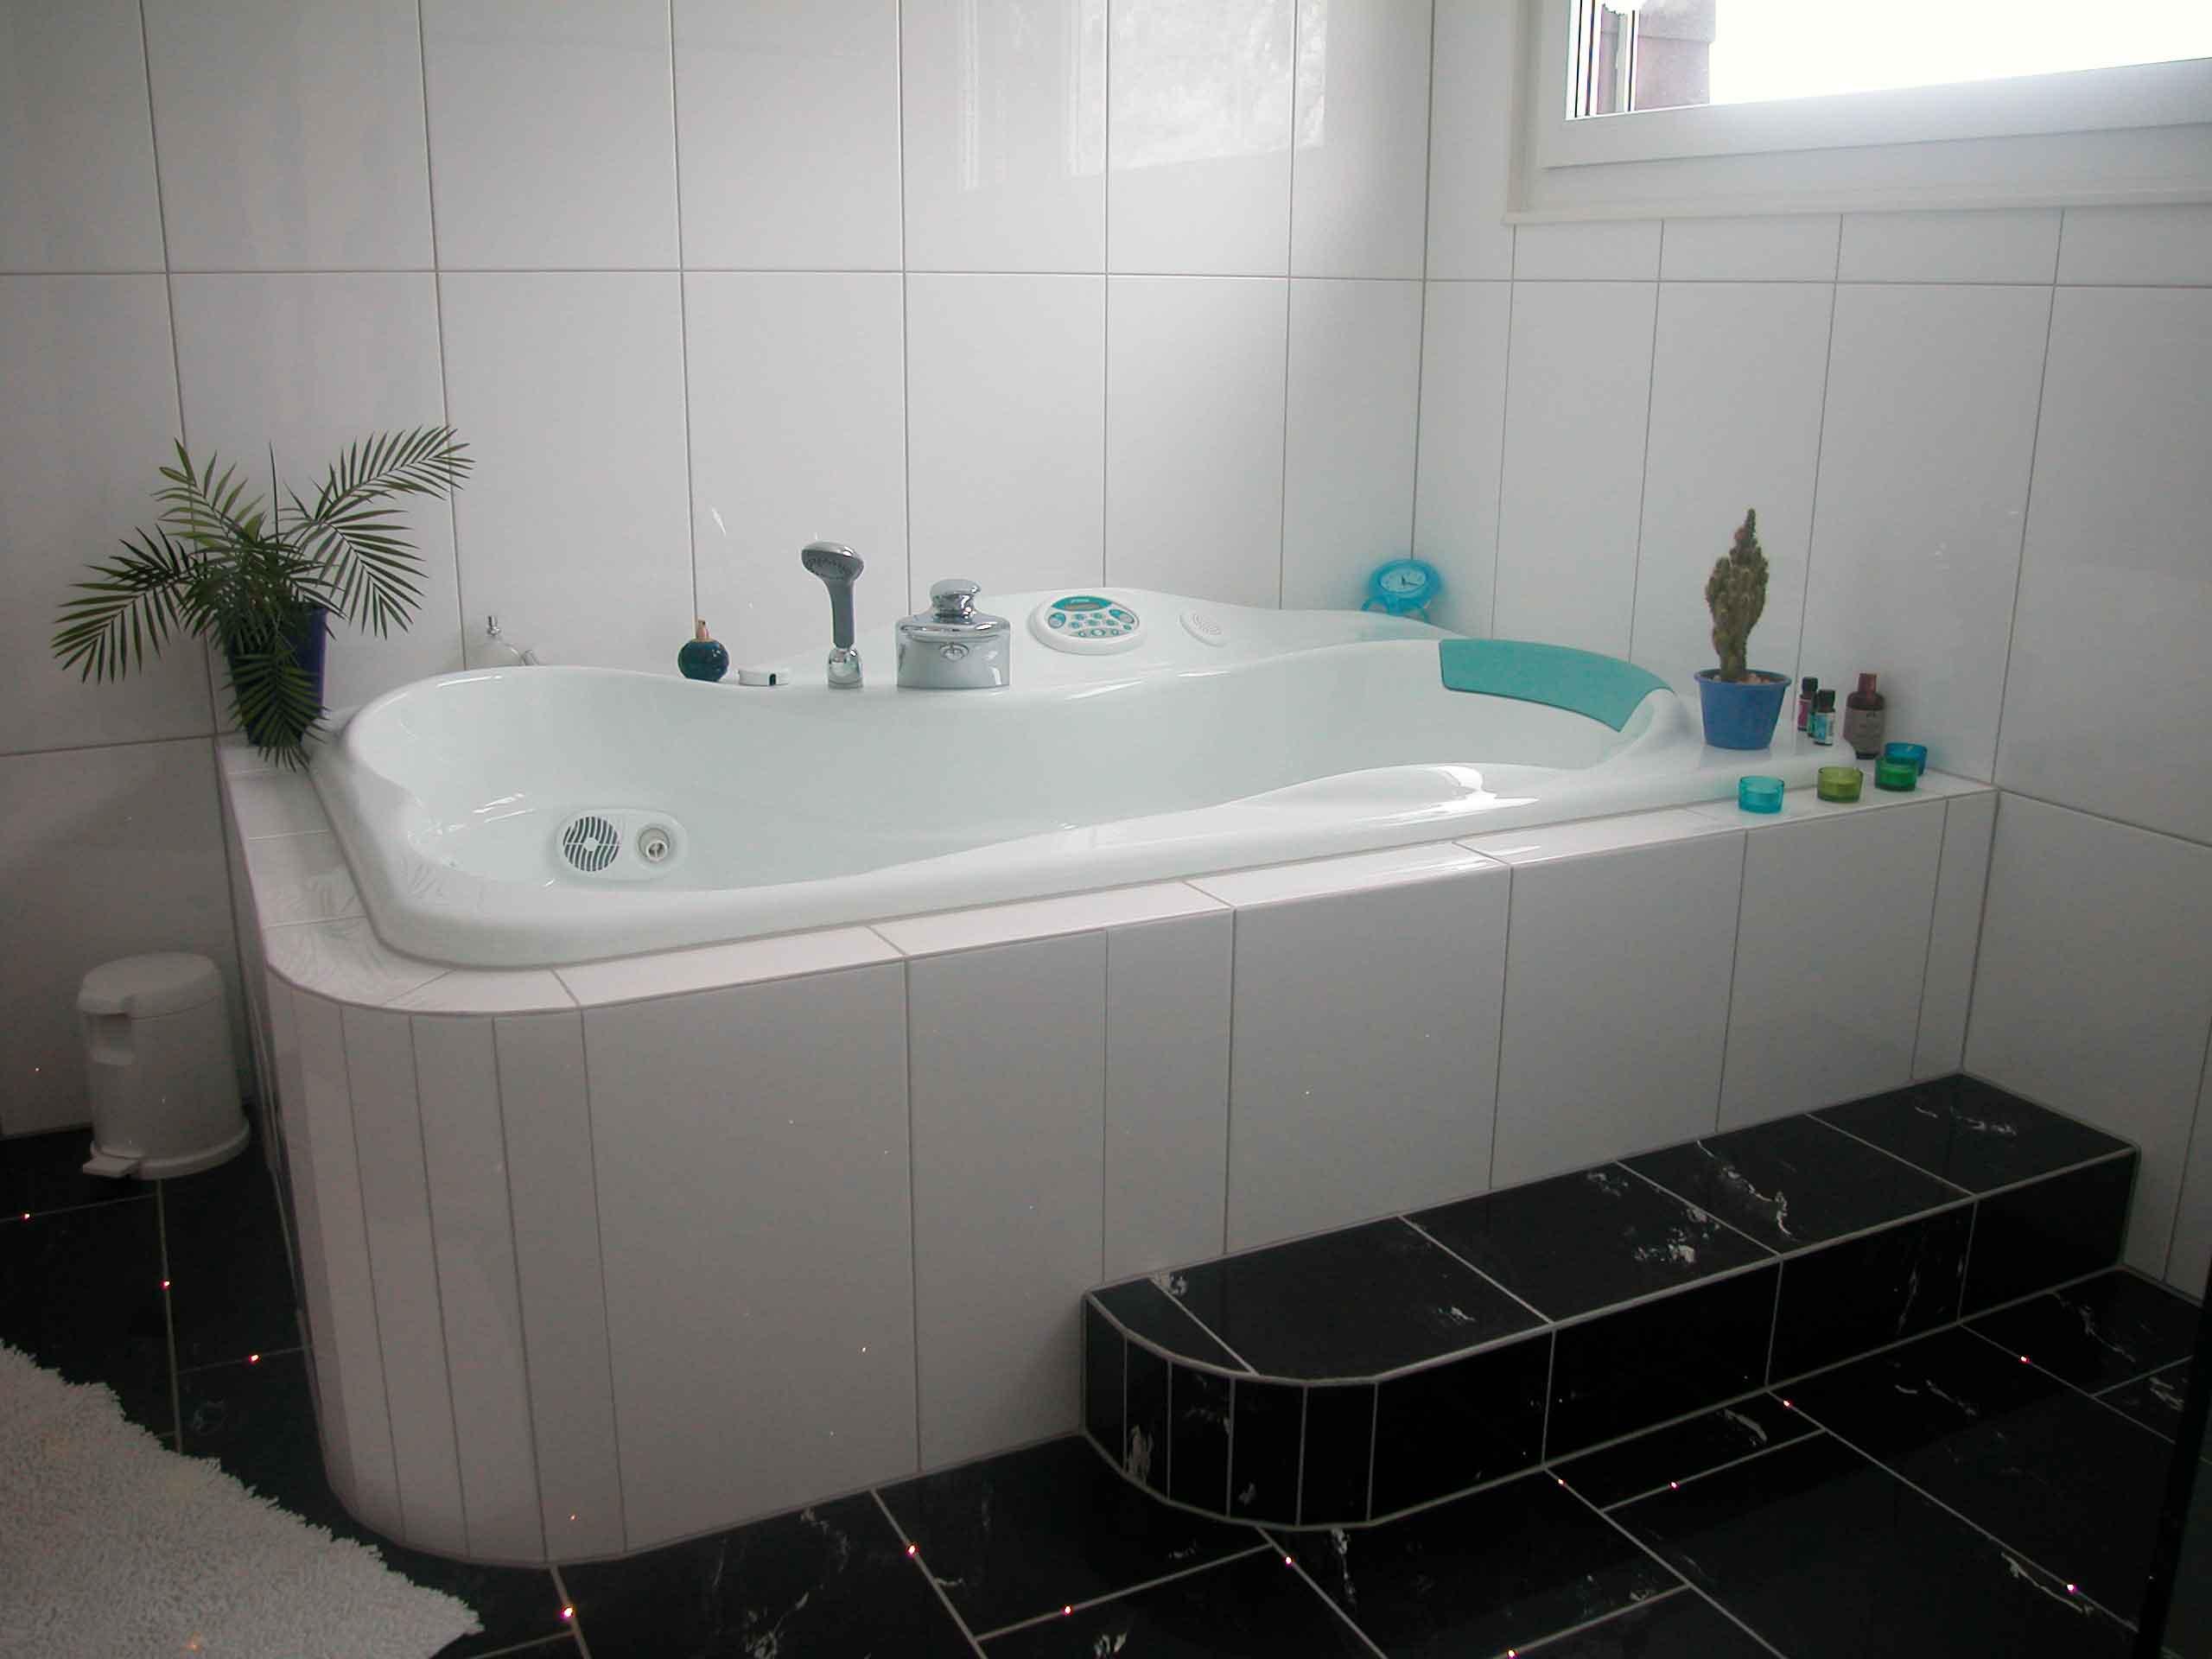 acryl badewanne einbauen anleitung silikonfuge badewanne beautiful badewanne with. Black Bedroom Furniture Sets. Home Design Ideas